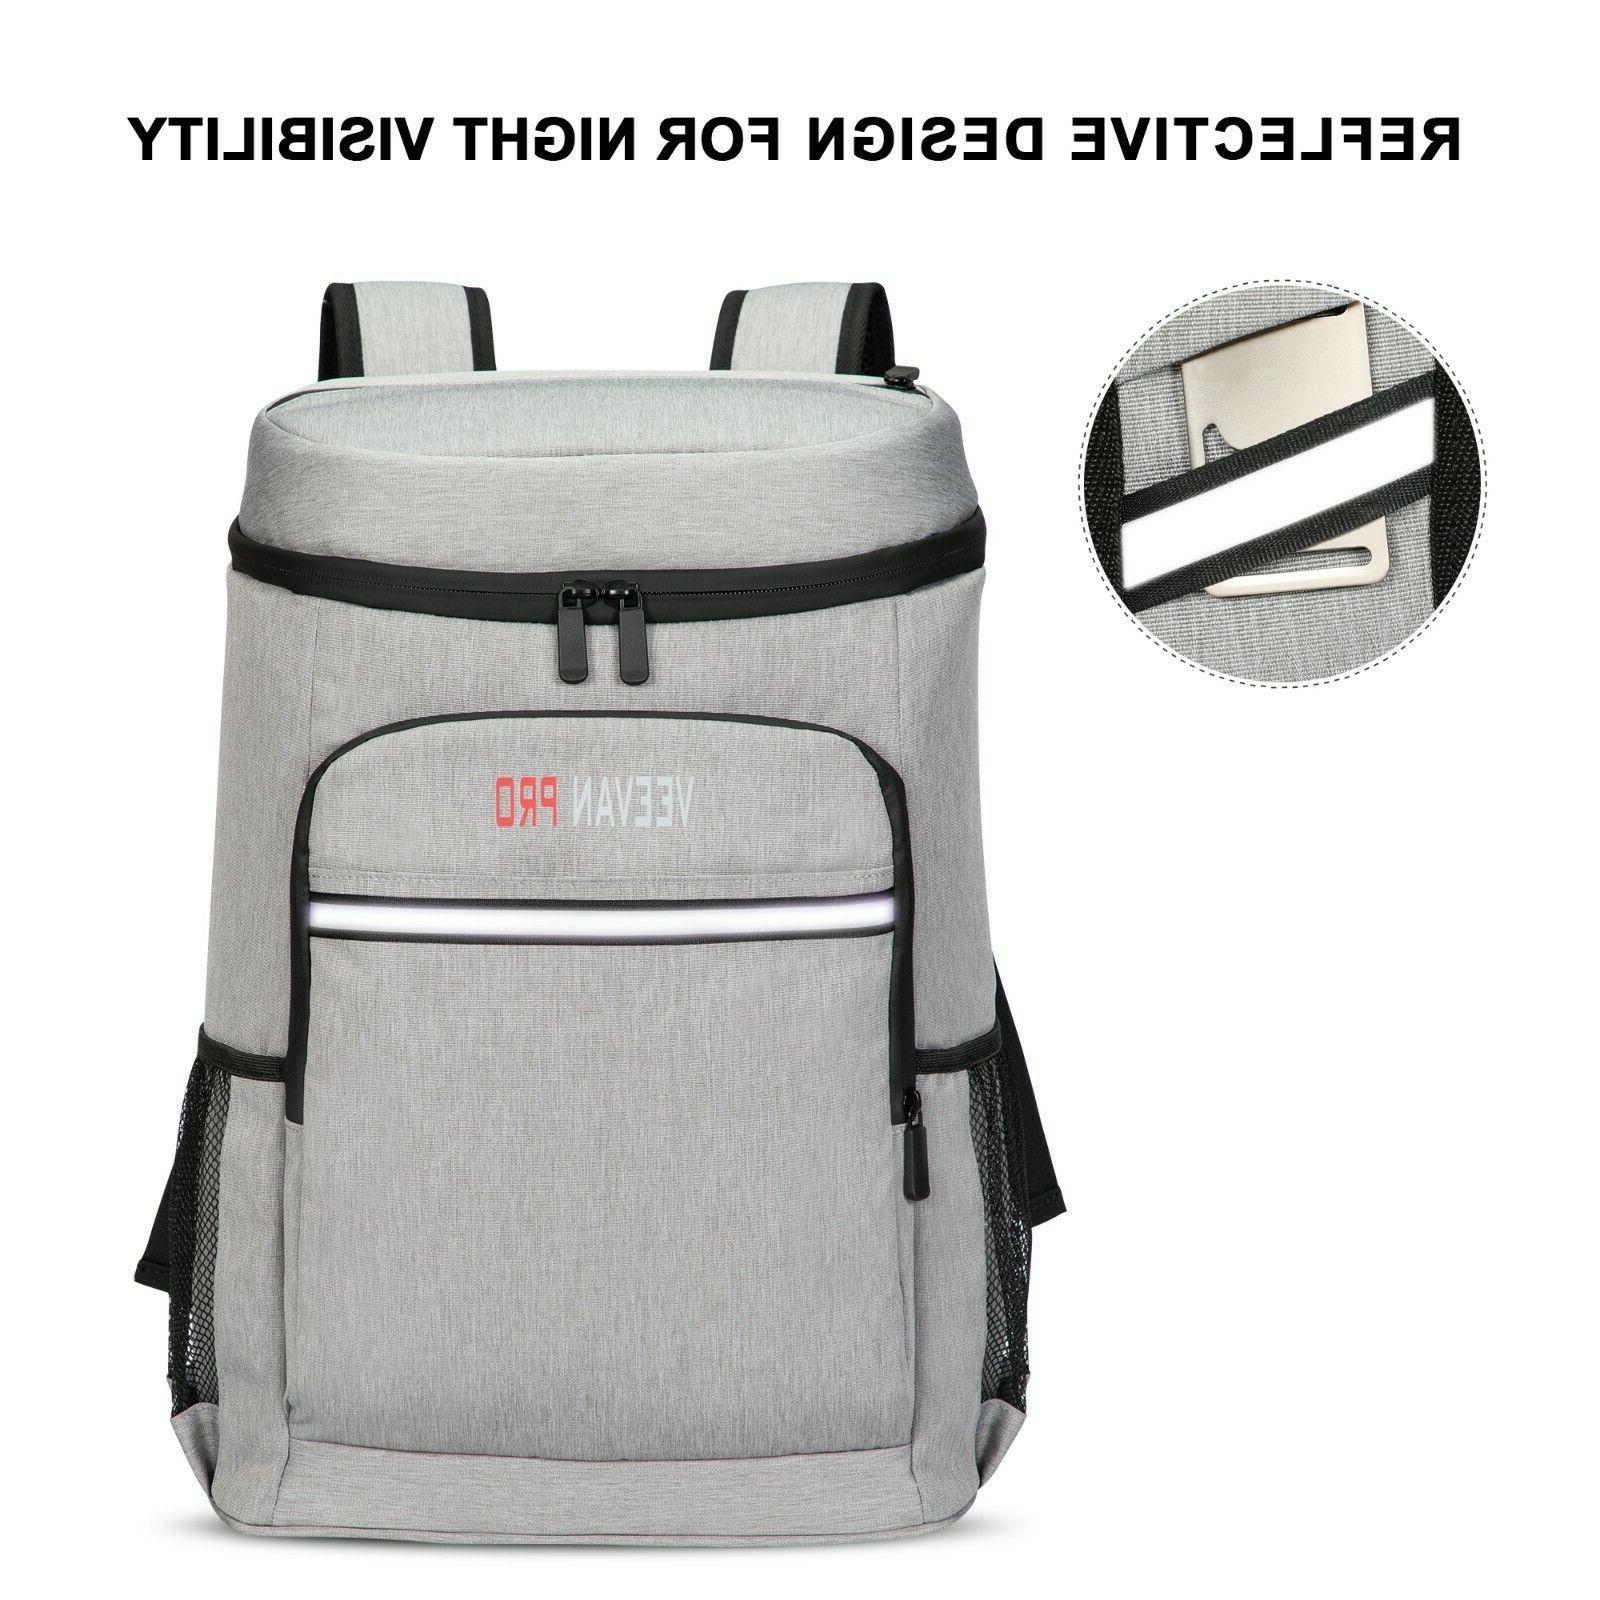 Backpack Leak-Proof Soft Cooler Women